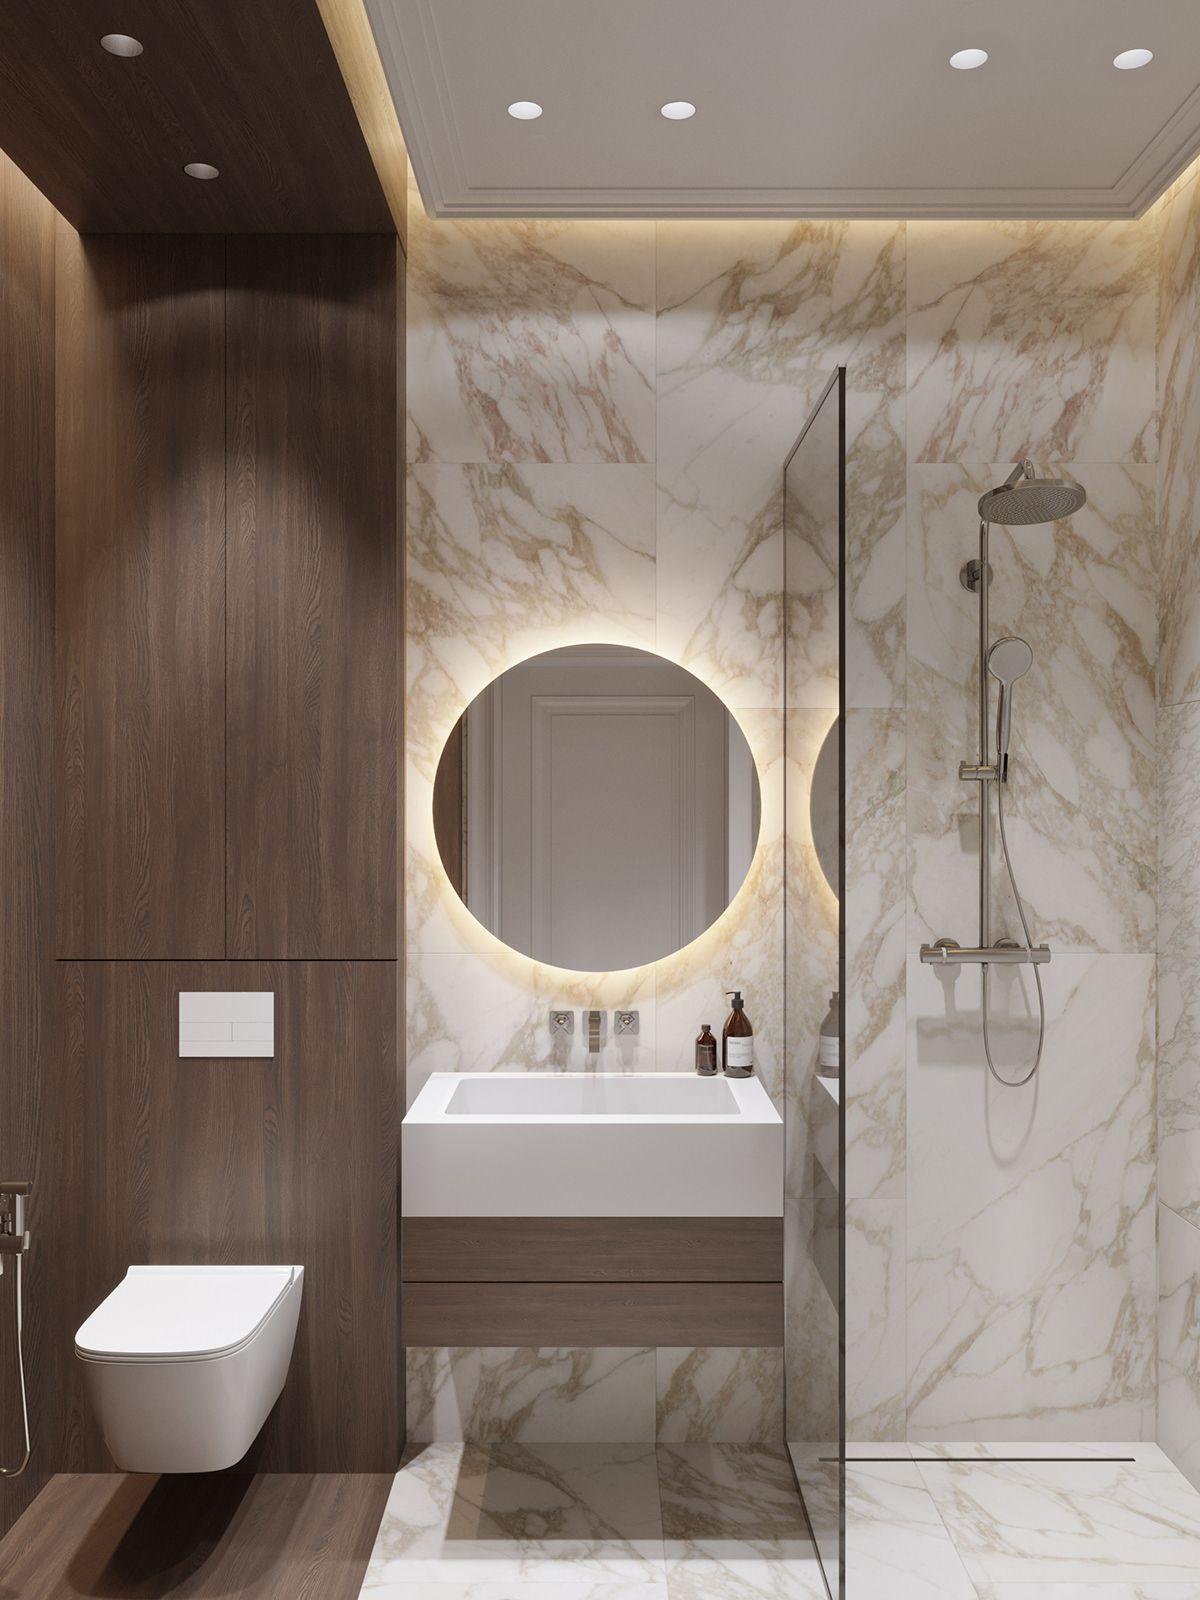 Rublevka Project On Behance Minimalist Bathroom Design Bathroom Design Decor Popular Bathroom Designs Minimalist luxury small bathroom